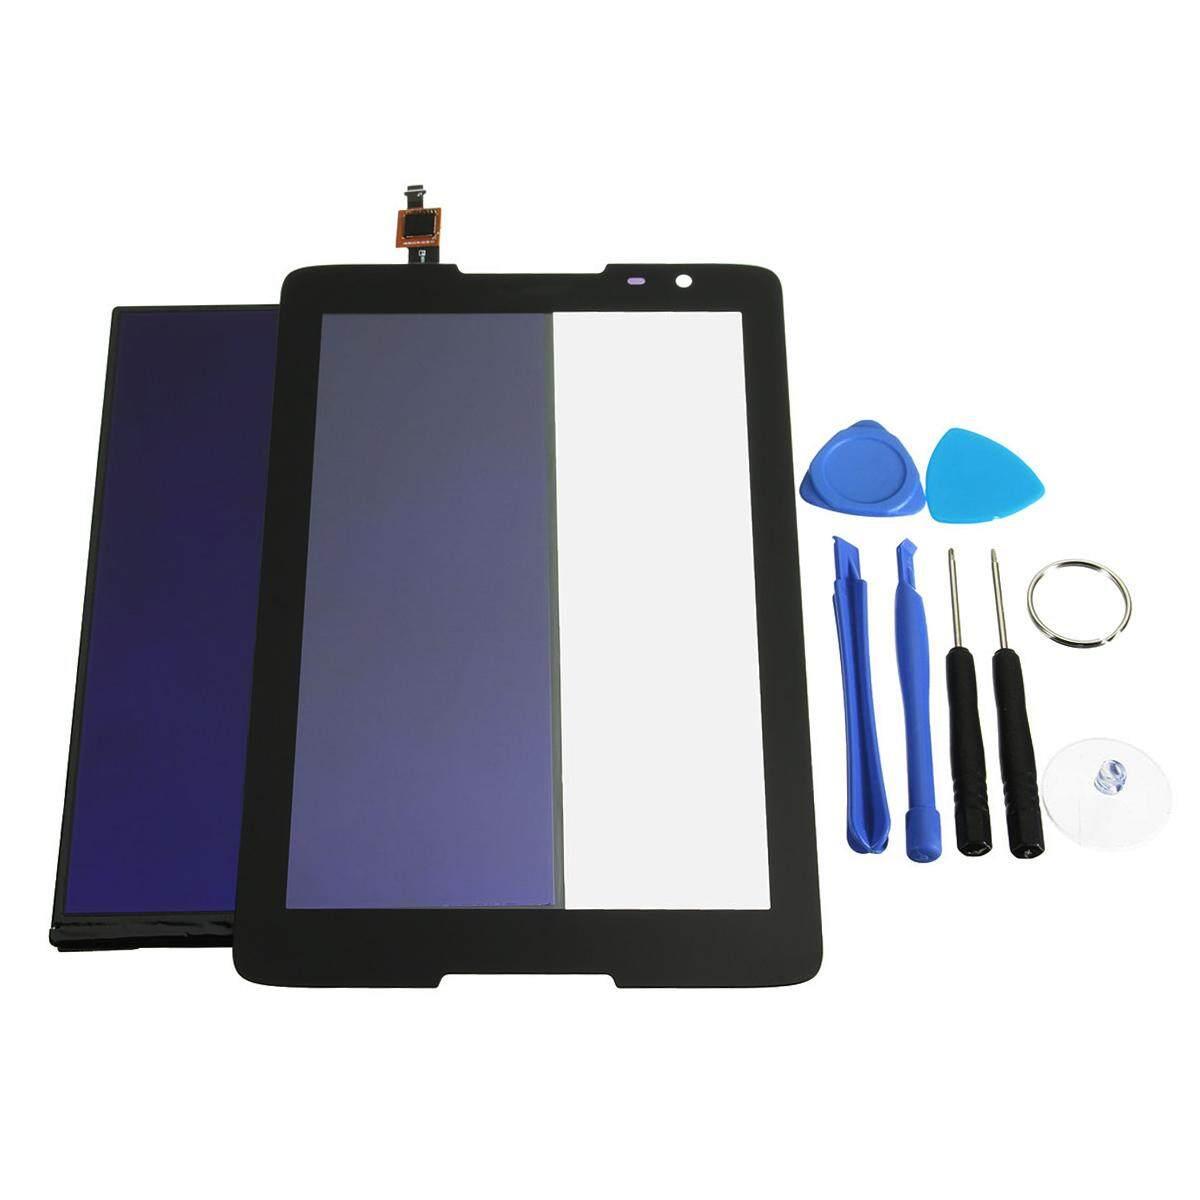 Layar Sentuh Digitizer + LCD Display + Alat untuk Lenovo IdeaTab A8-50 A5500 A5500F-Intl